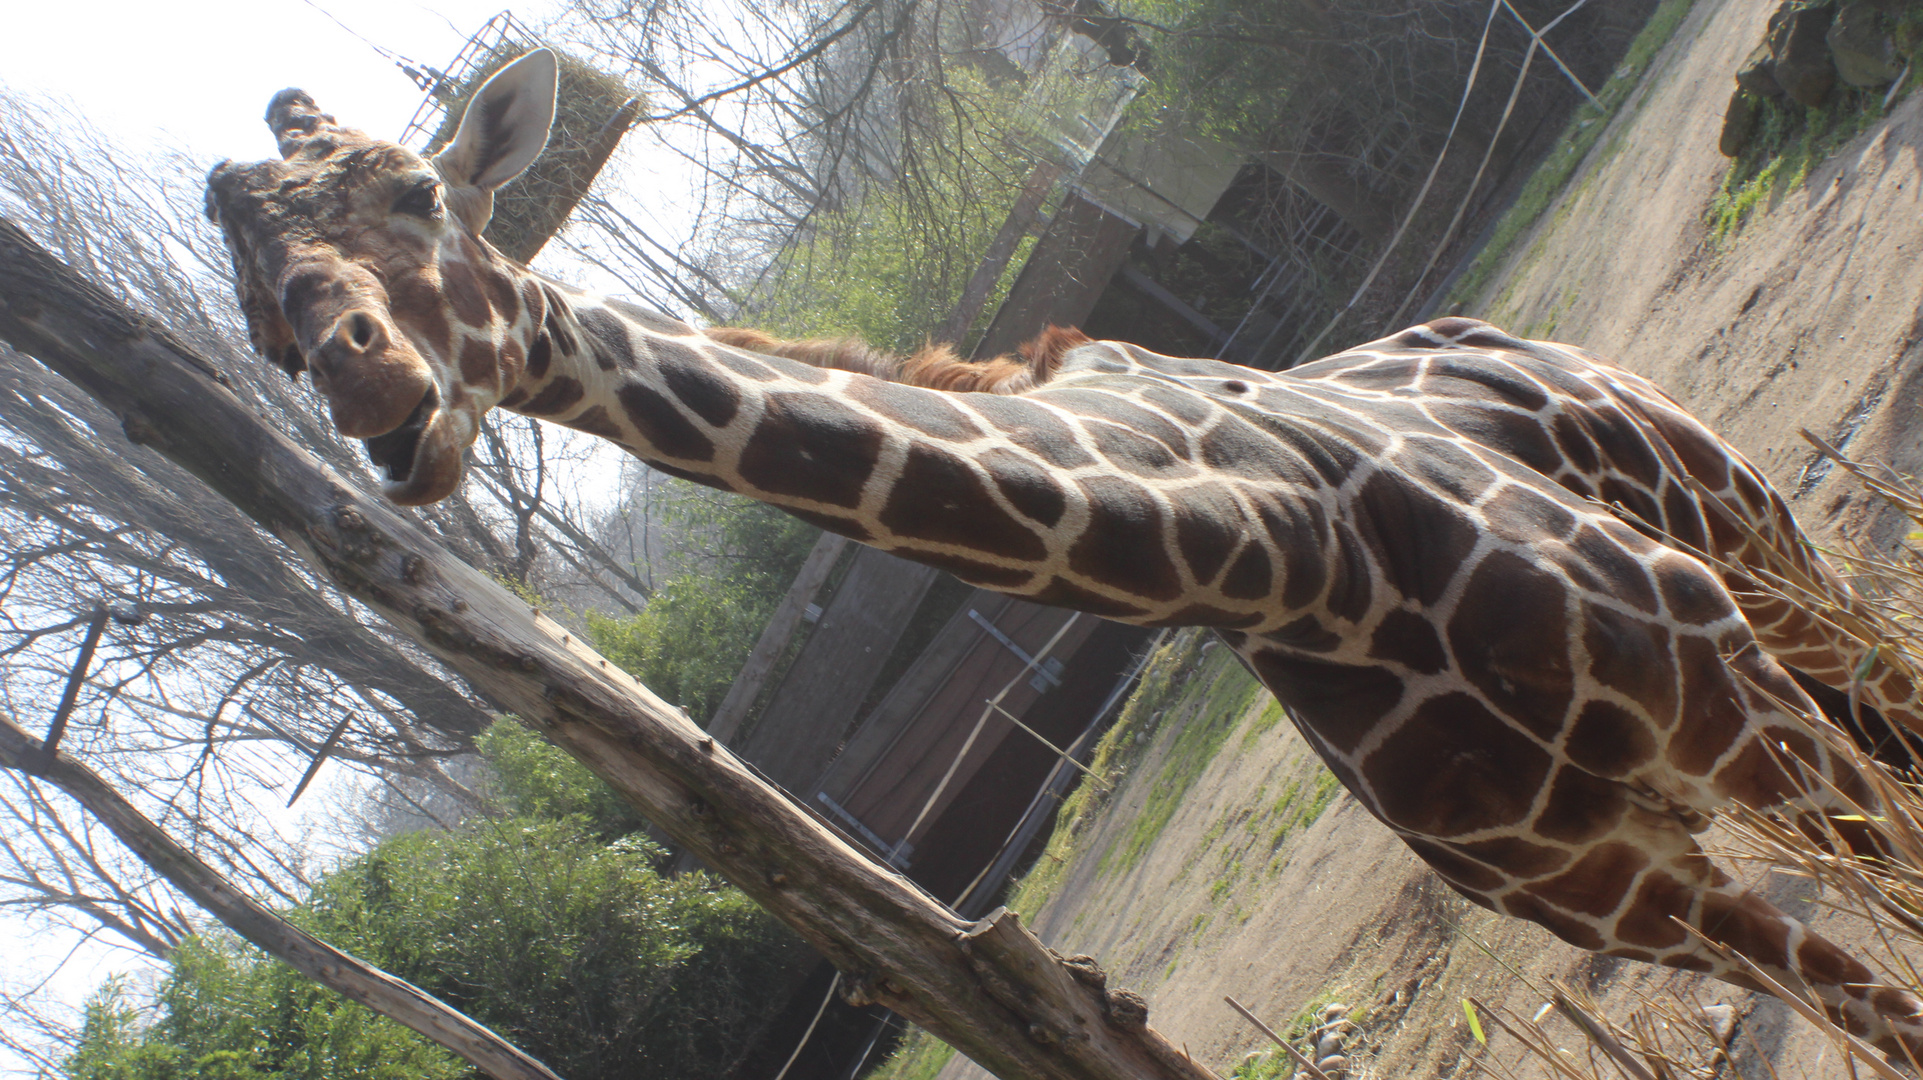 Giraffe im Zoo Duisburg